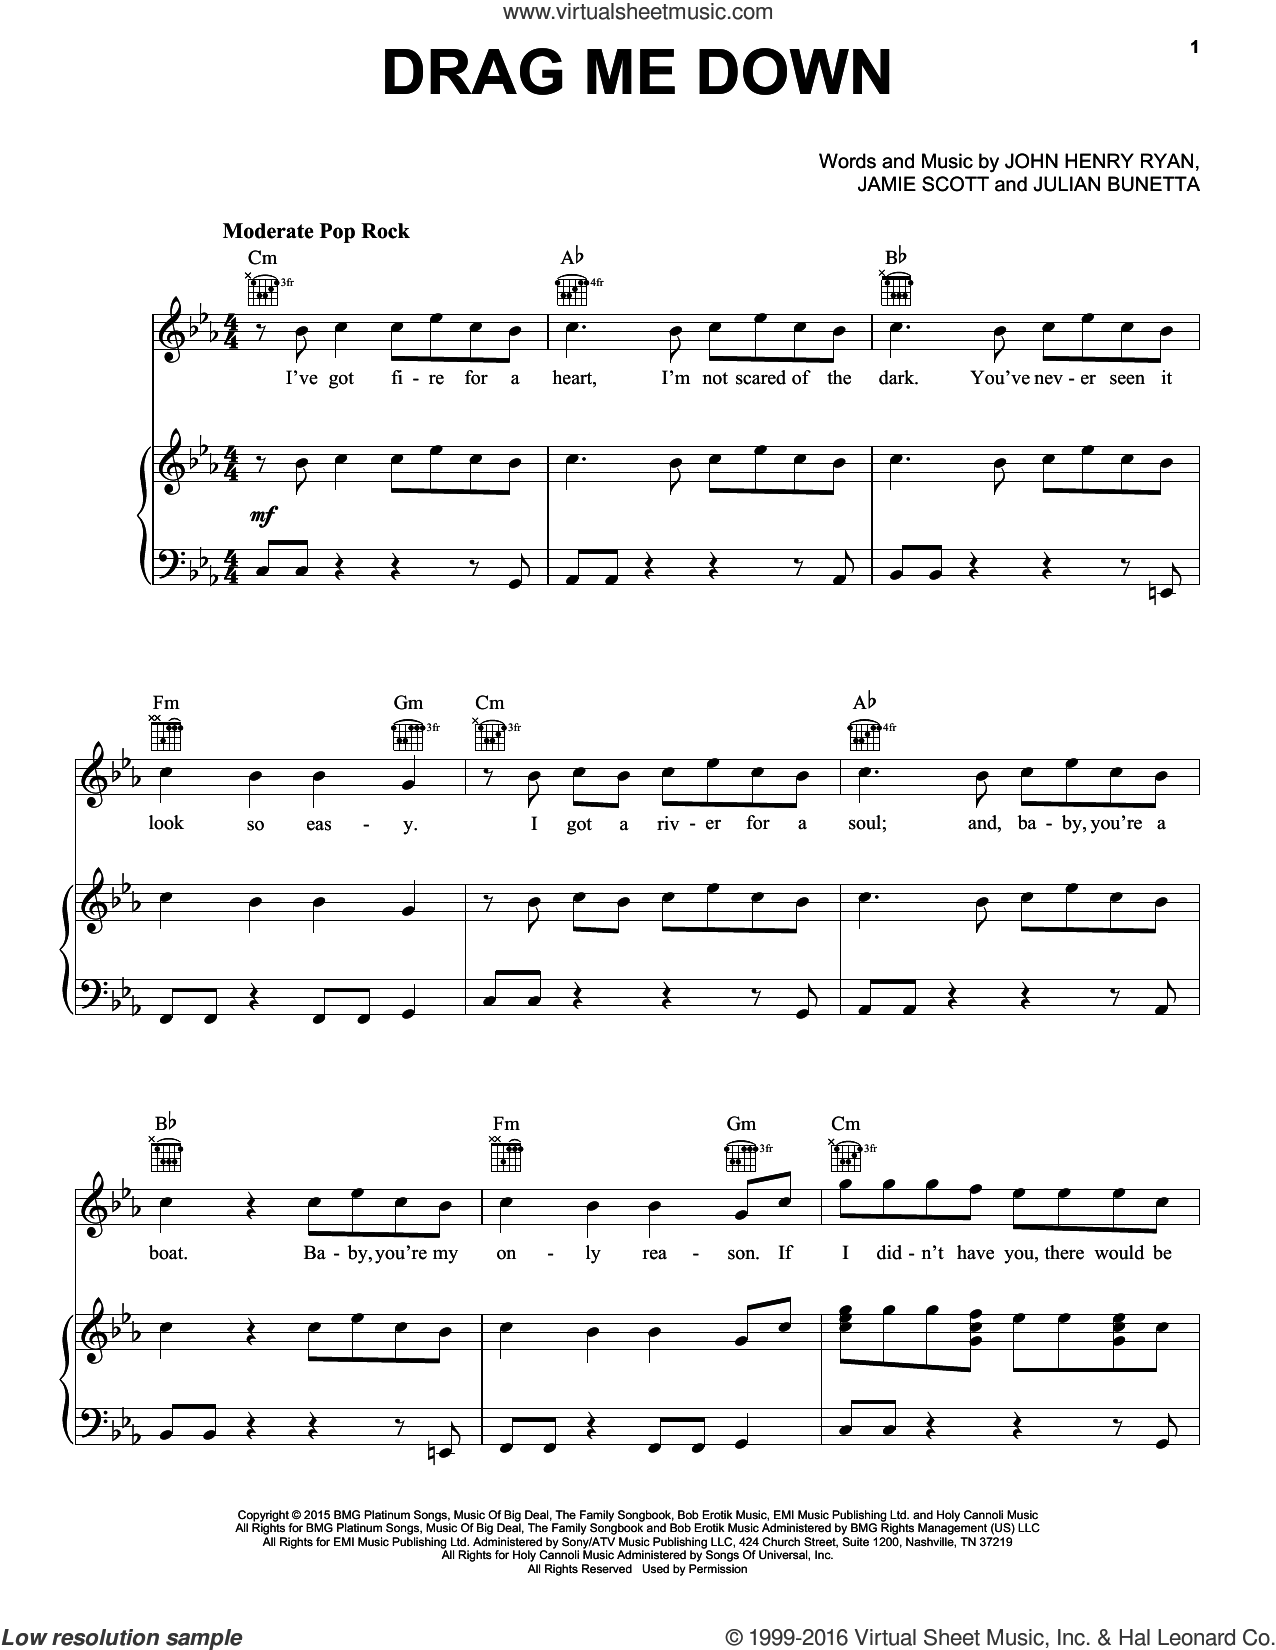 Drag Me Down sheet music for voice, piano or guitar by One Direction, Jamie Scott, John Henry Ryan and Julian Bunetta, intermediate skill level